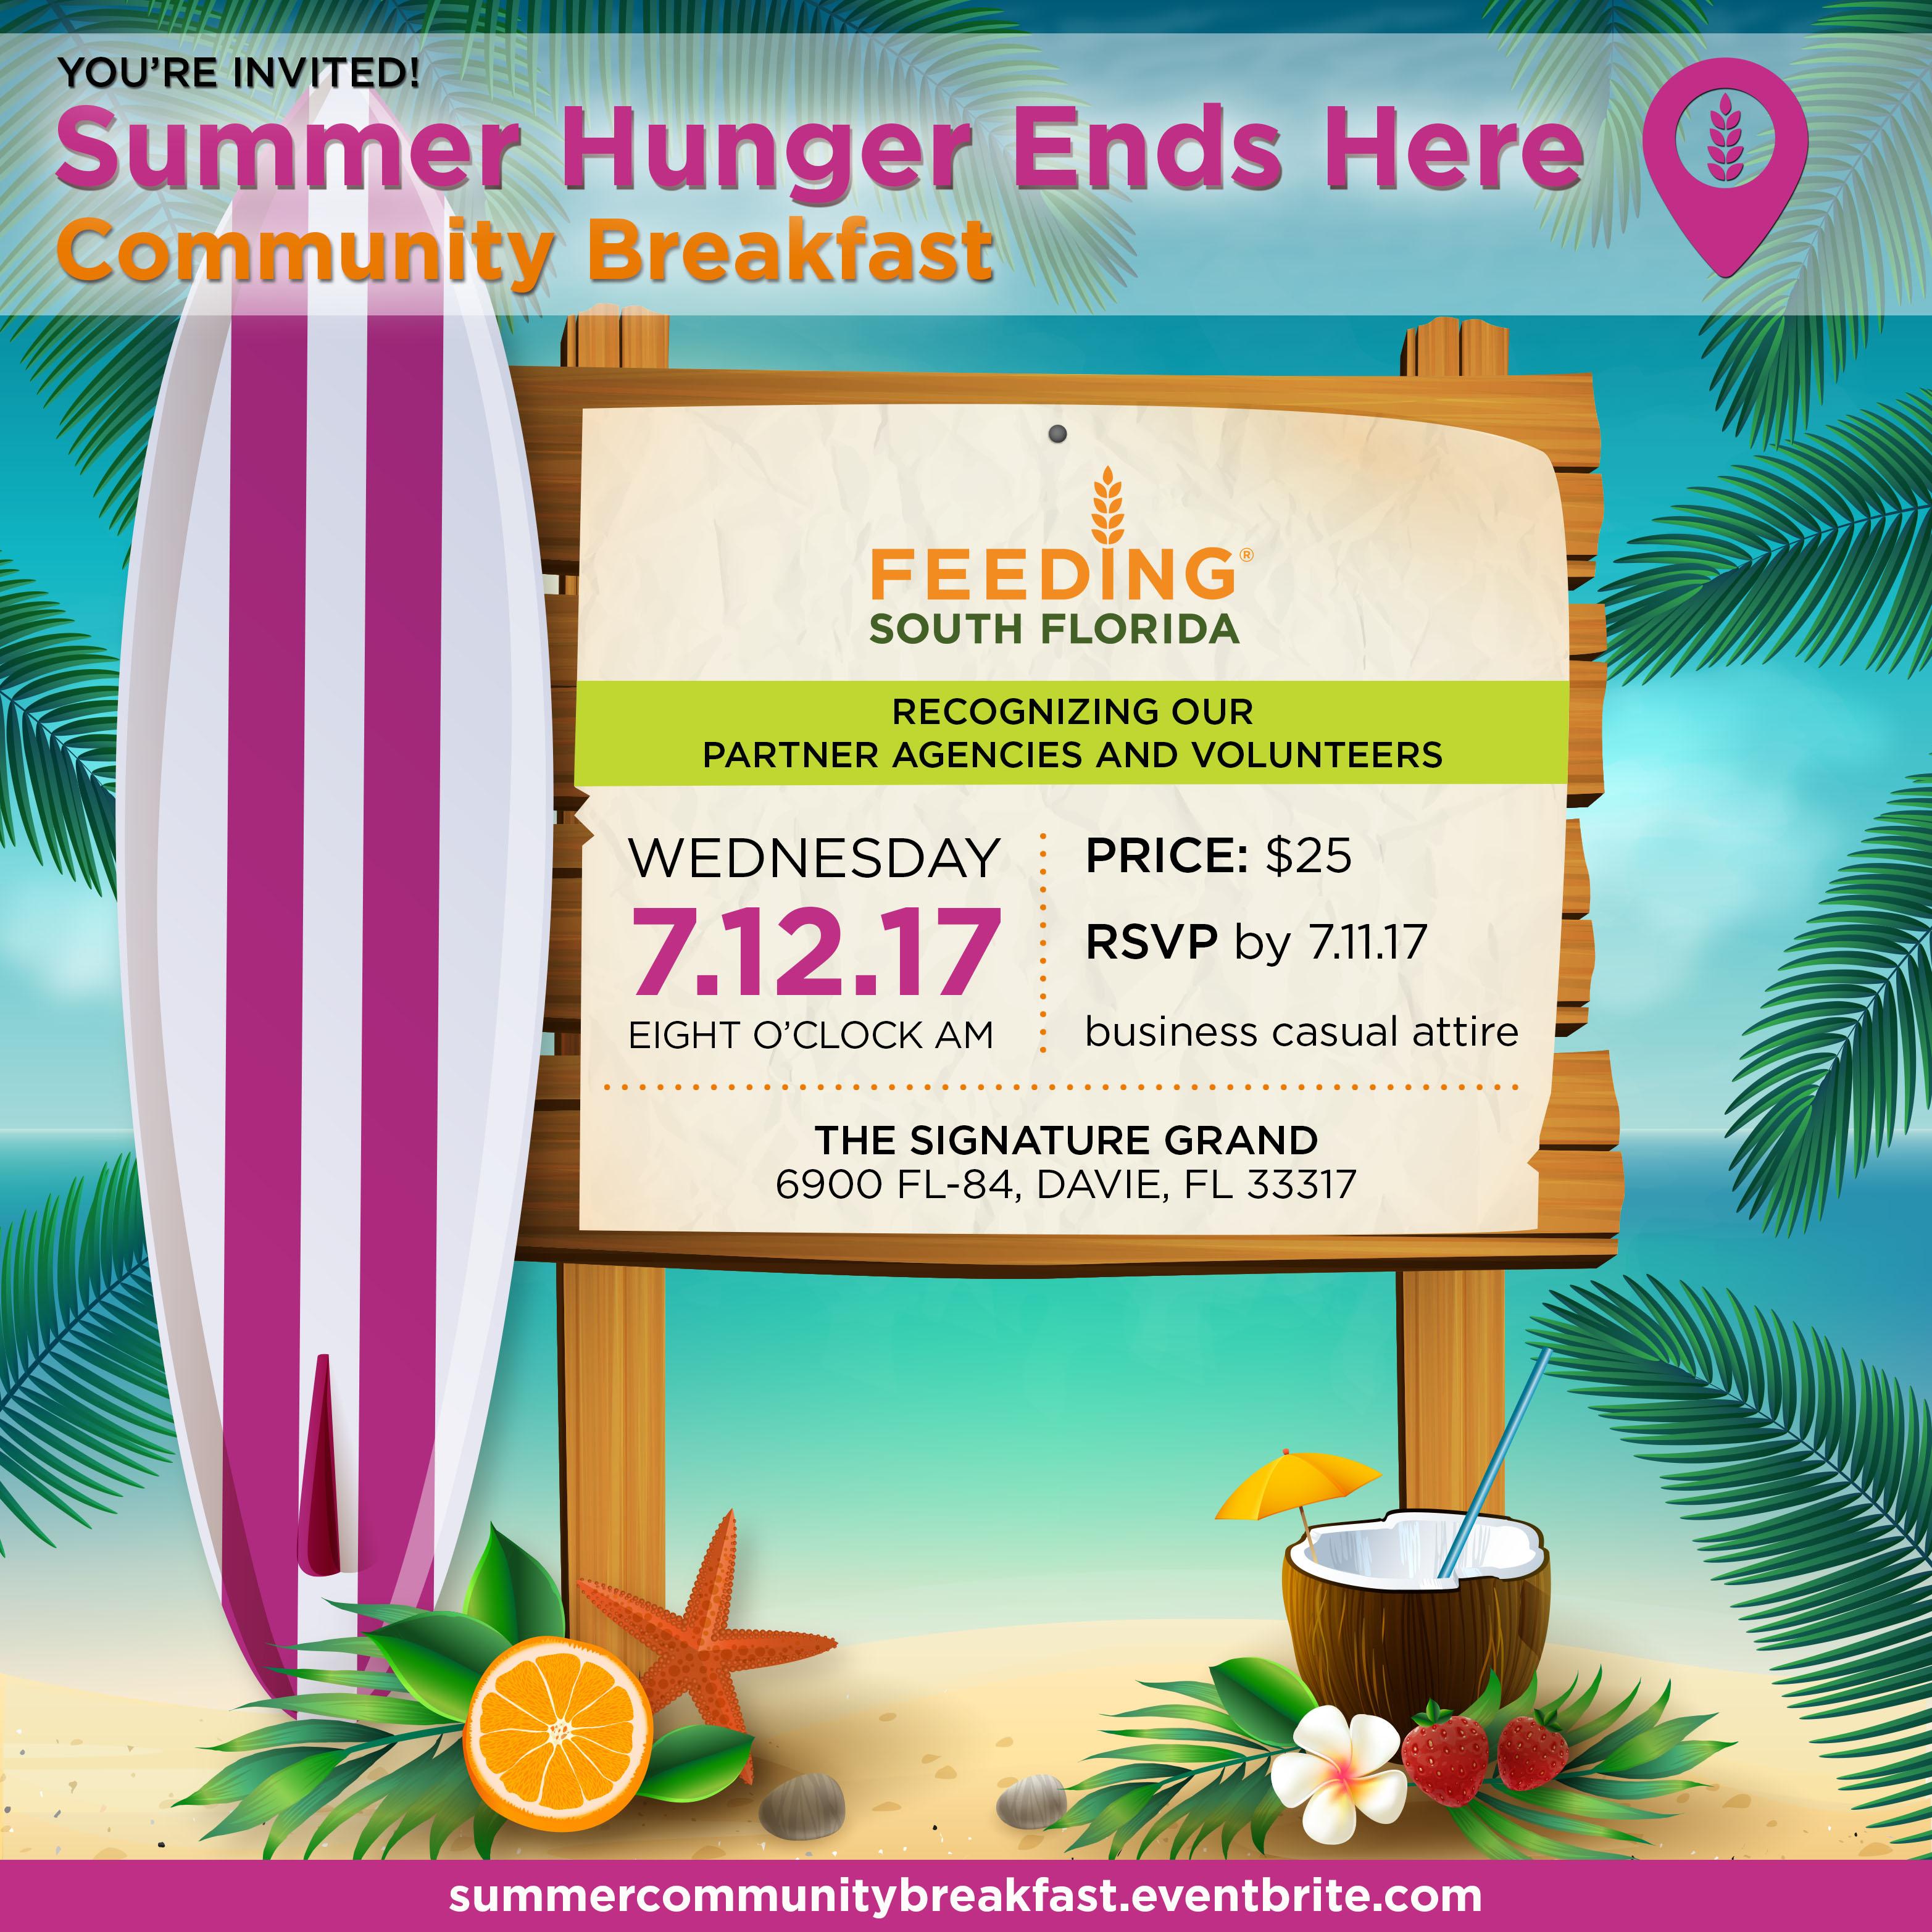 Summer Hunger Ends Here Community Breakfast